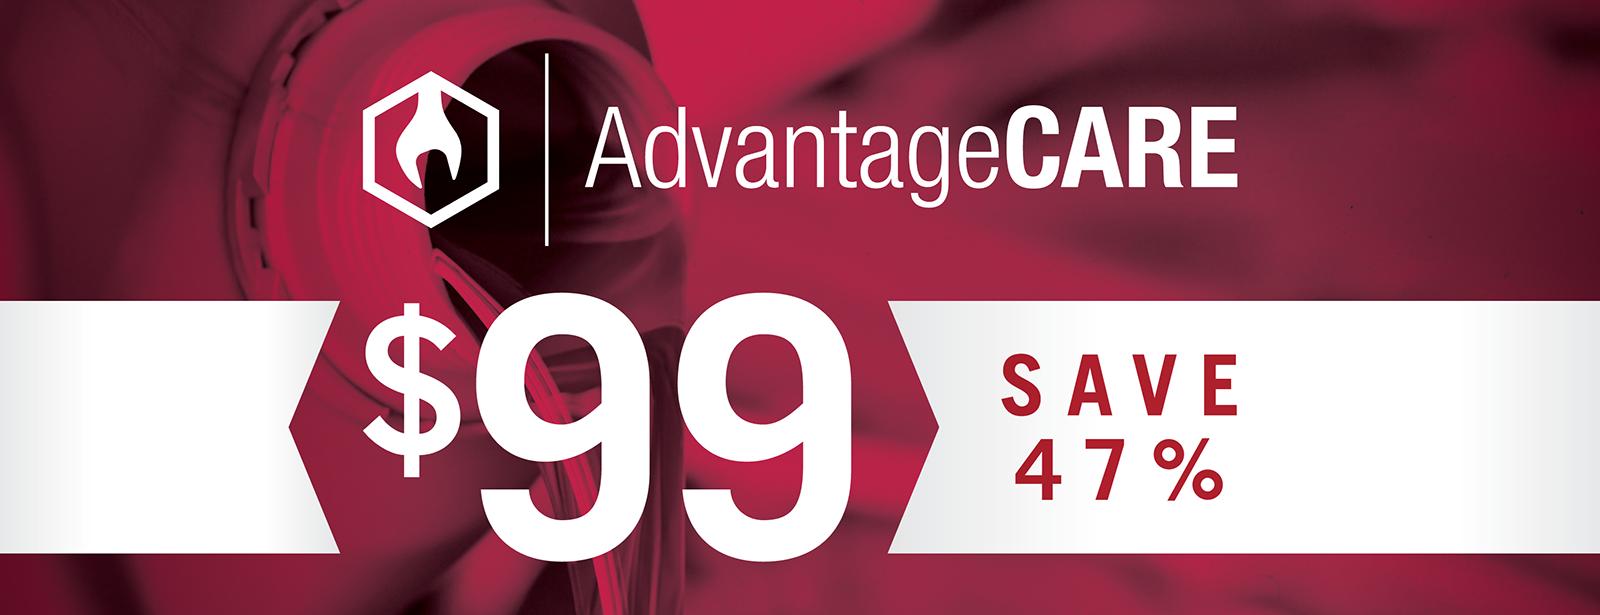 advantagecare ken garff auto group